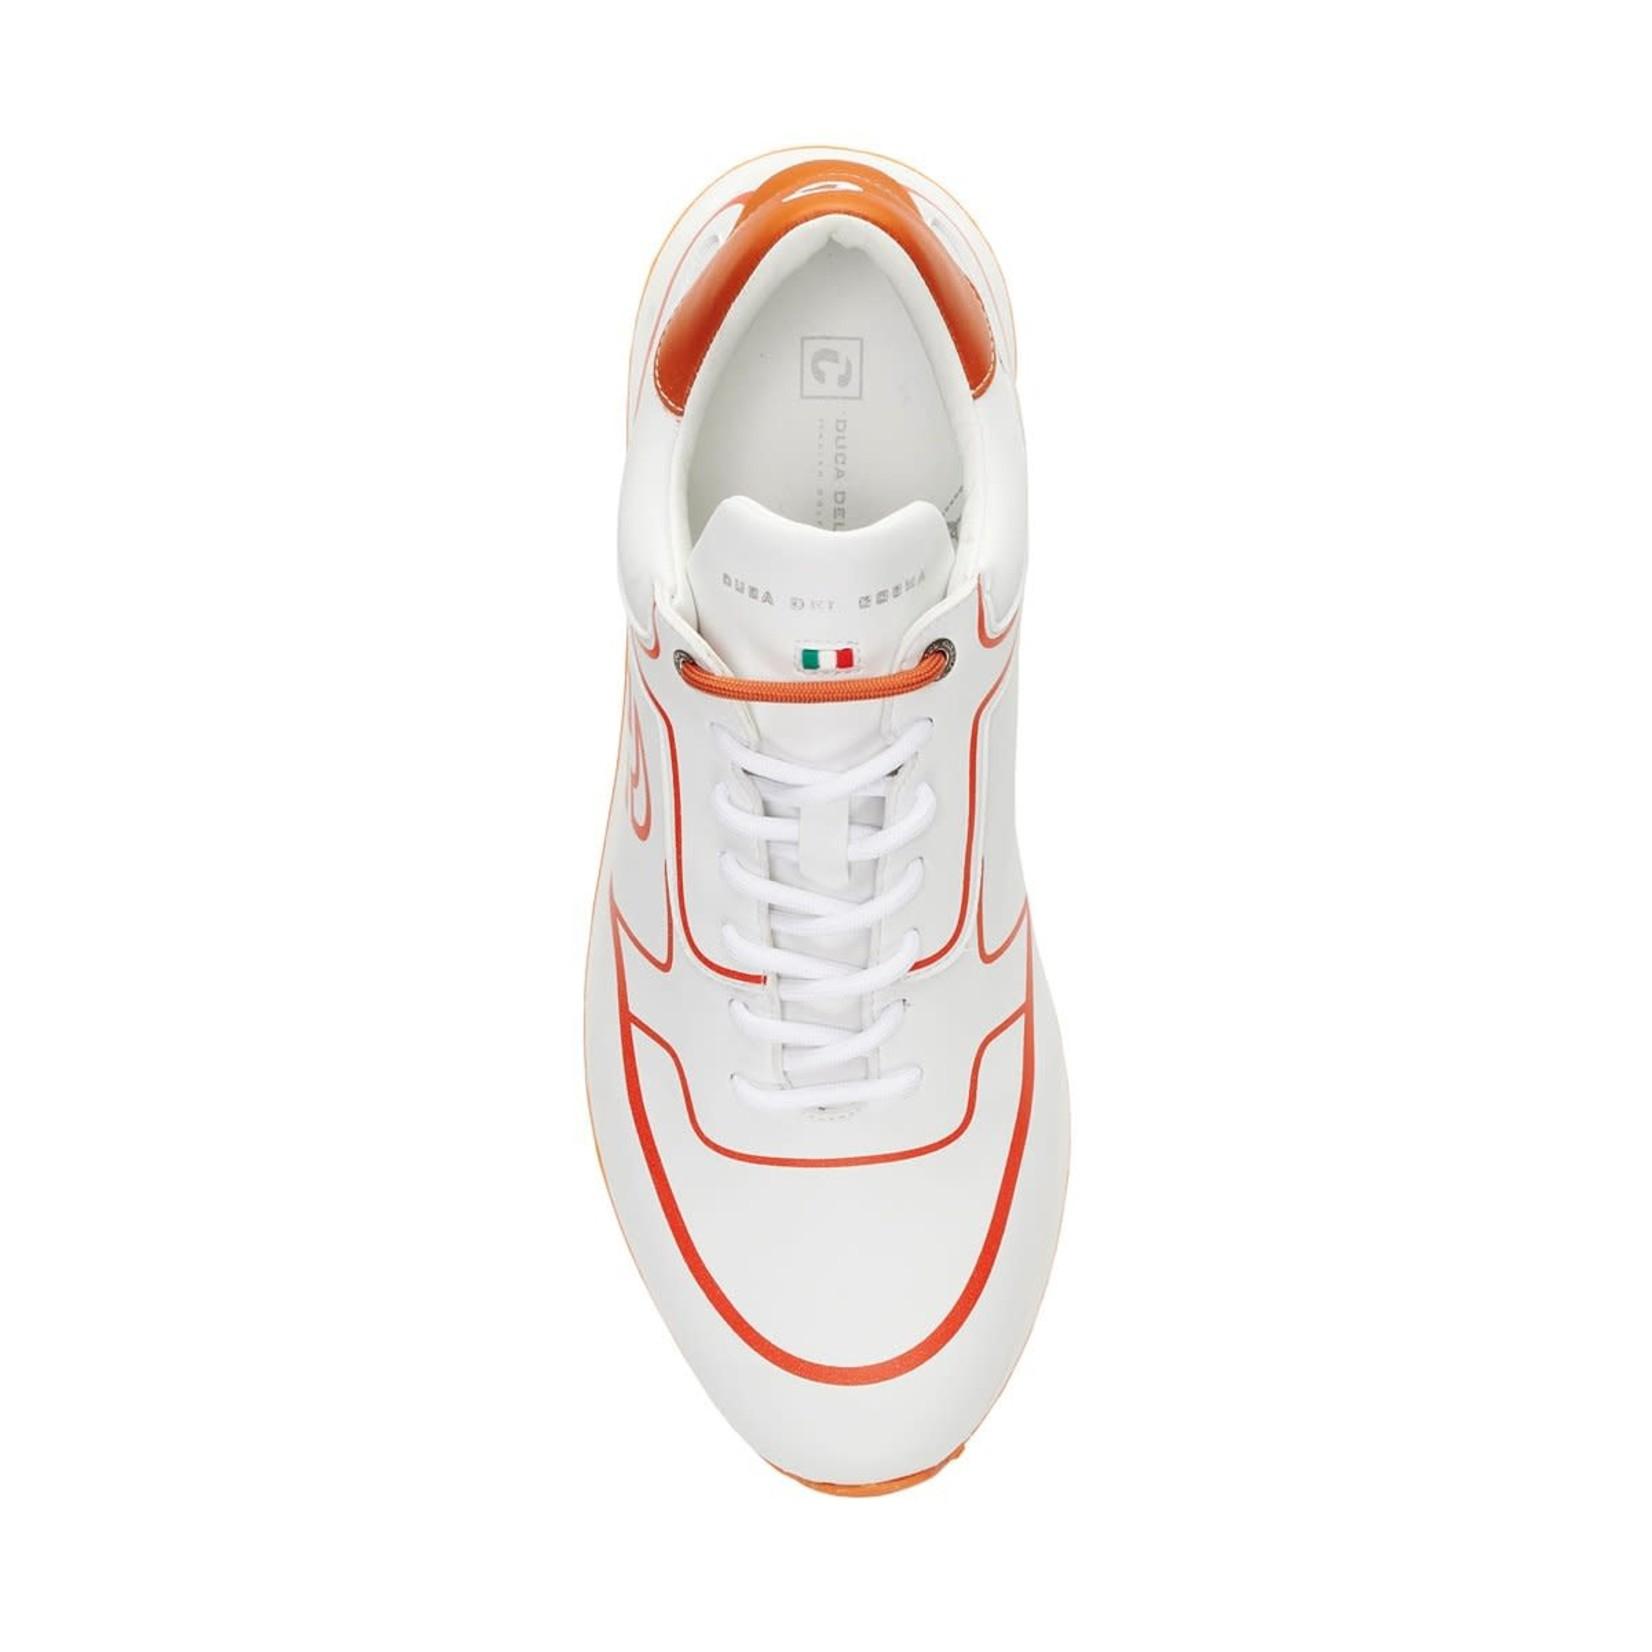 Duca del Cosma Duca del Cosma - Joost Luiten 3 Flyer White/Orange